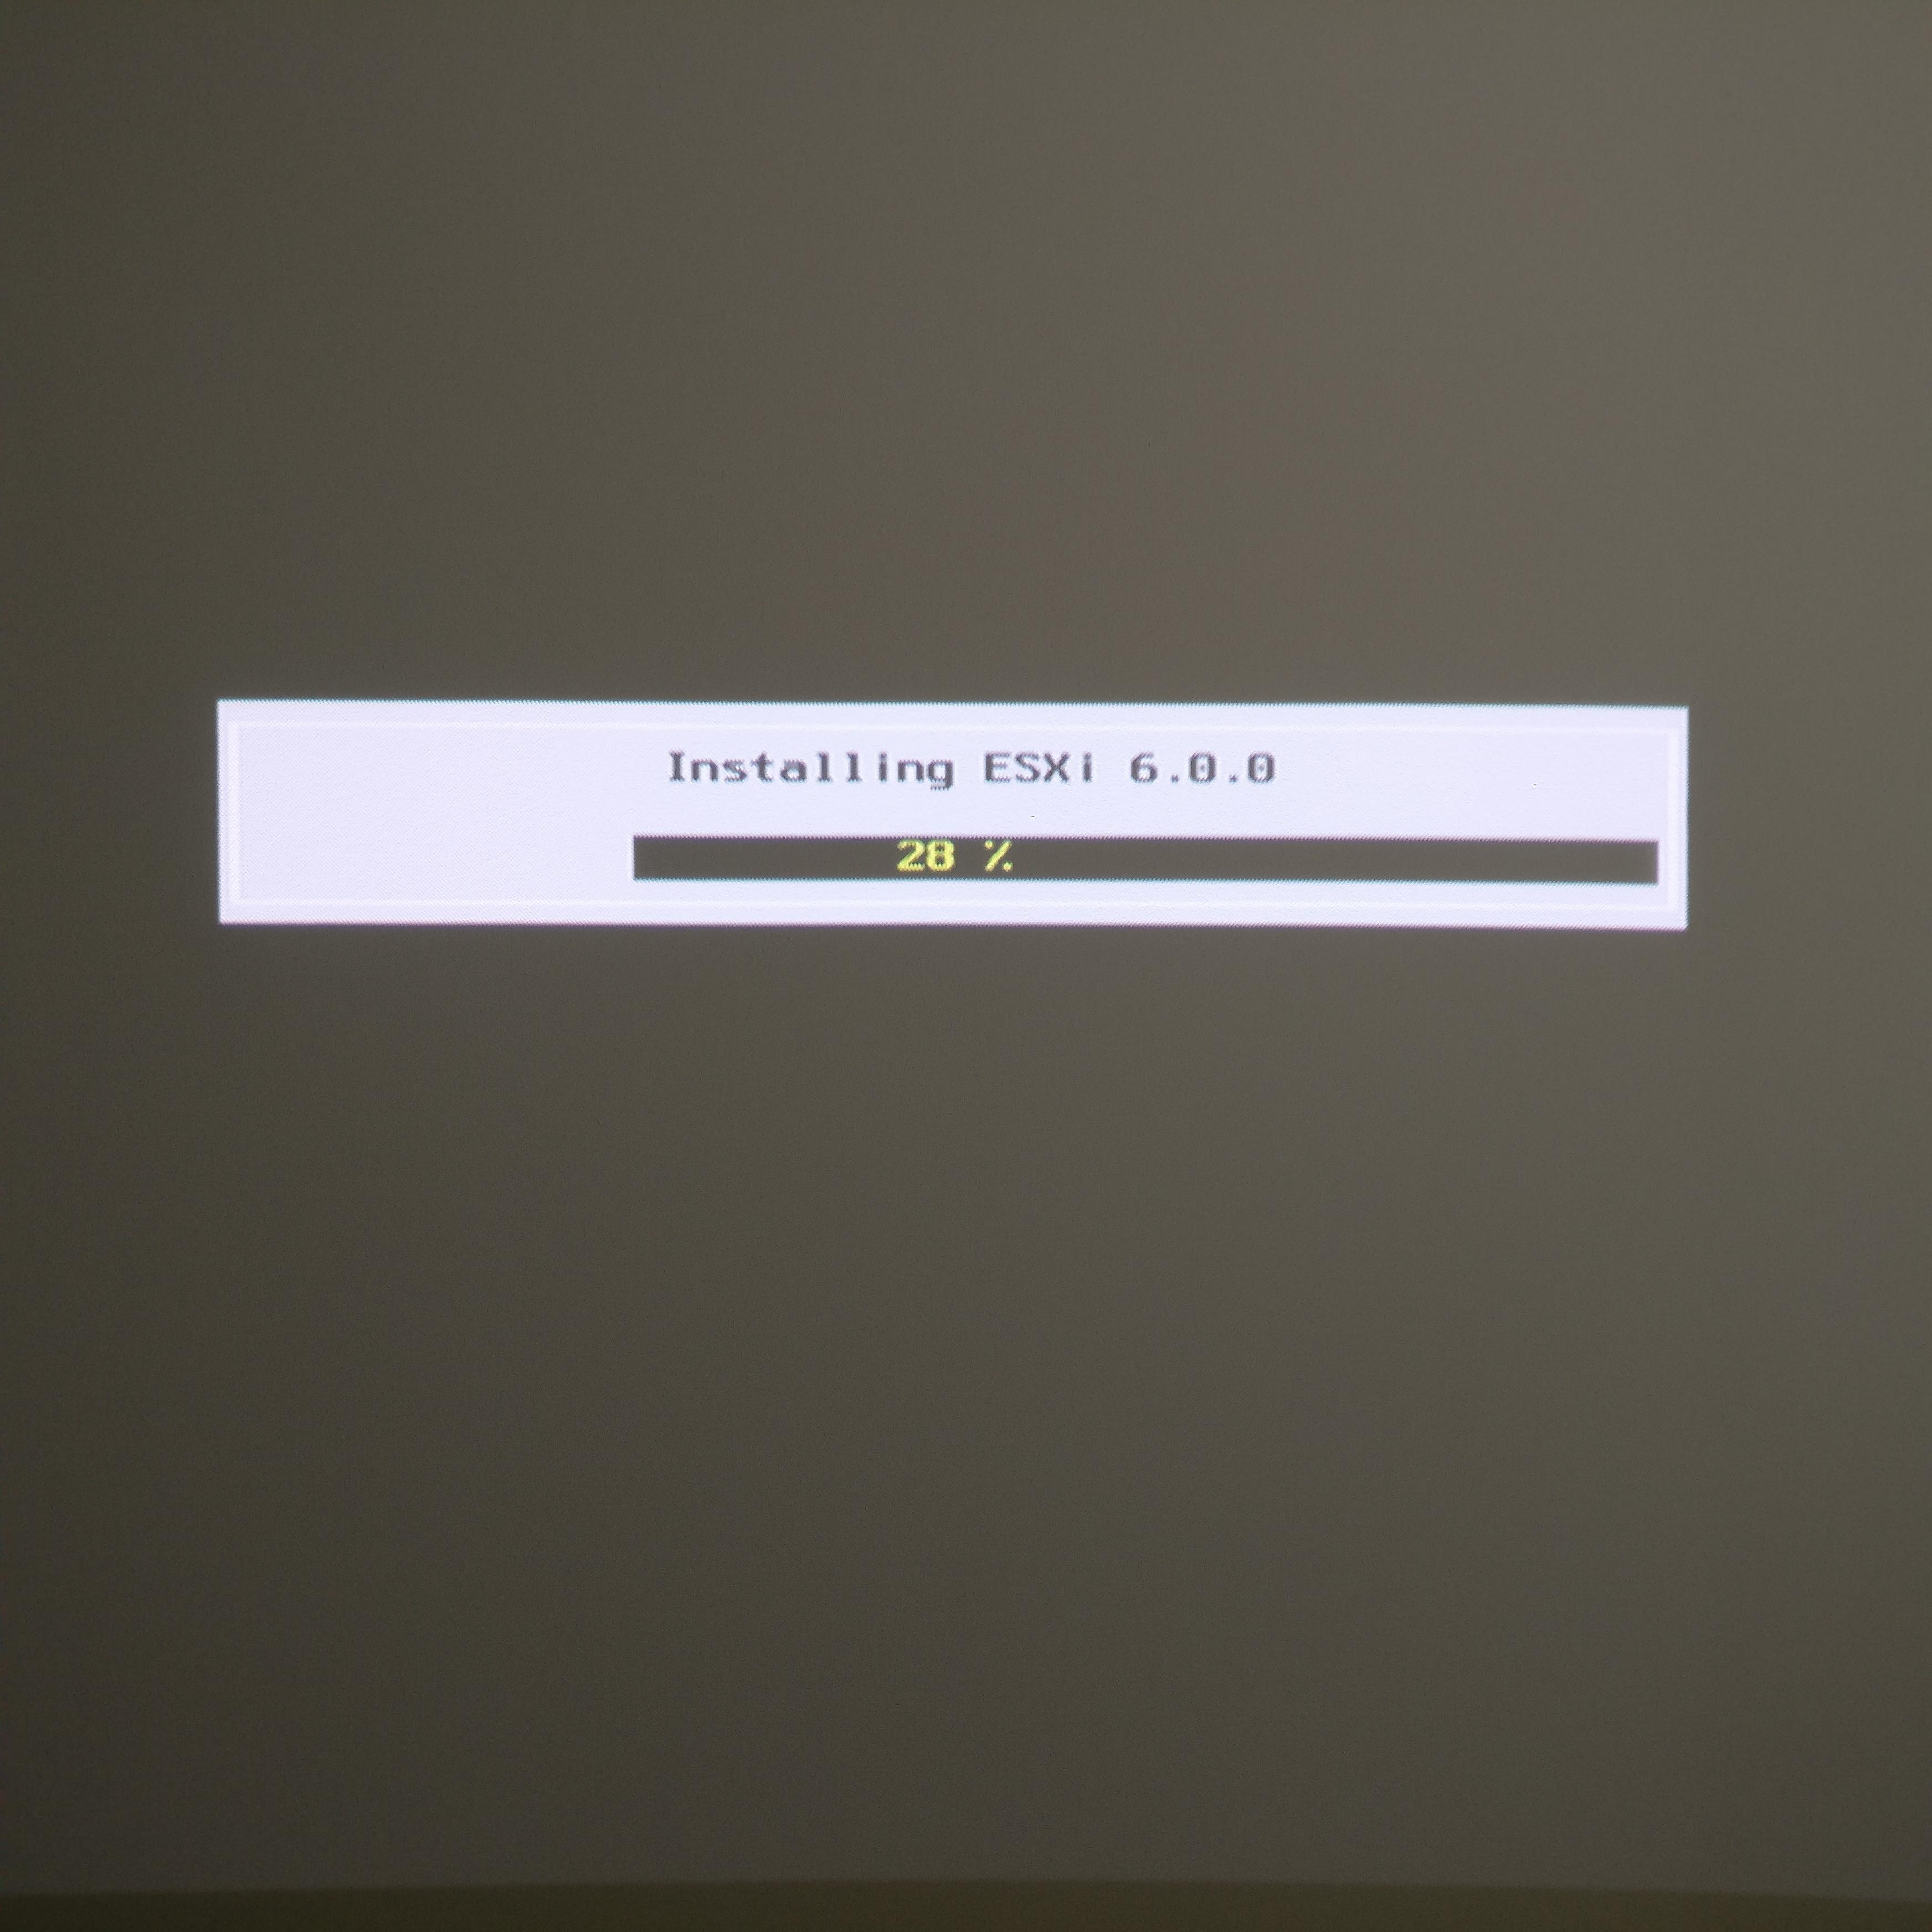 domalab.com Intel NUC ESXi Hypervisor install progress